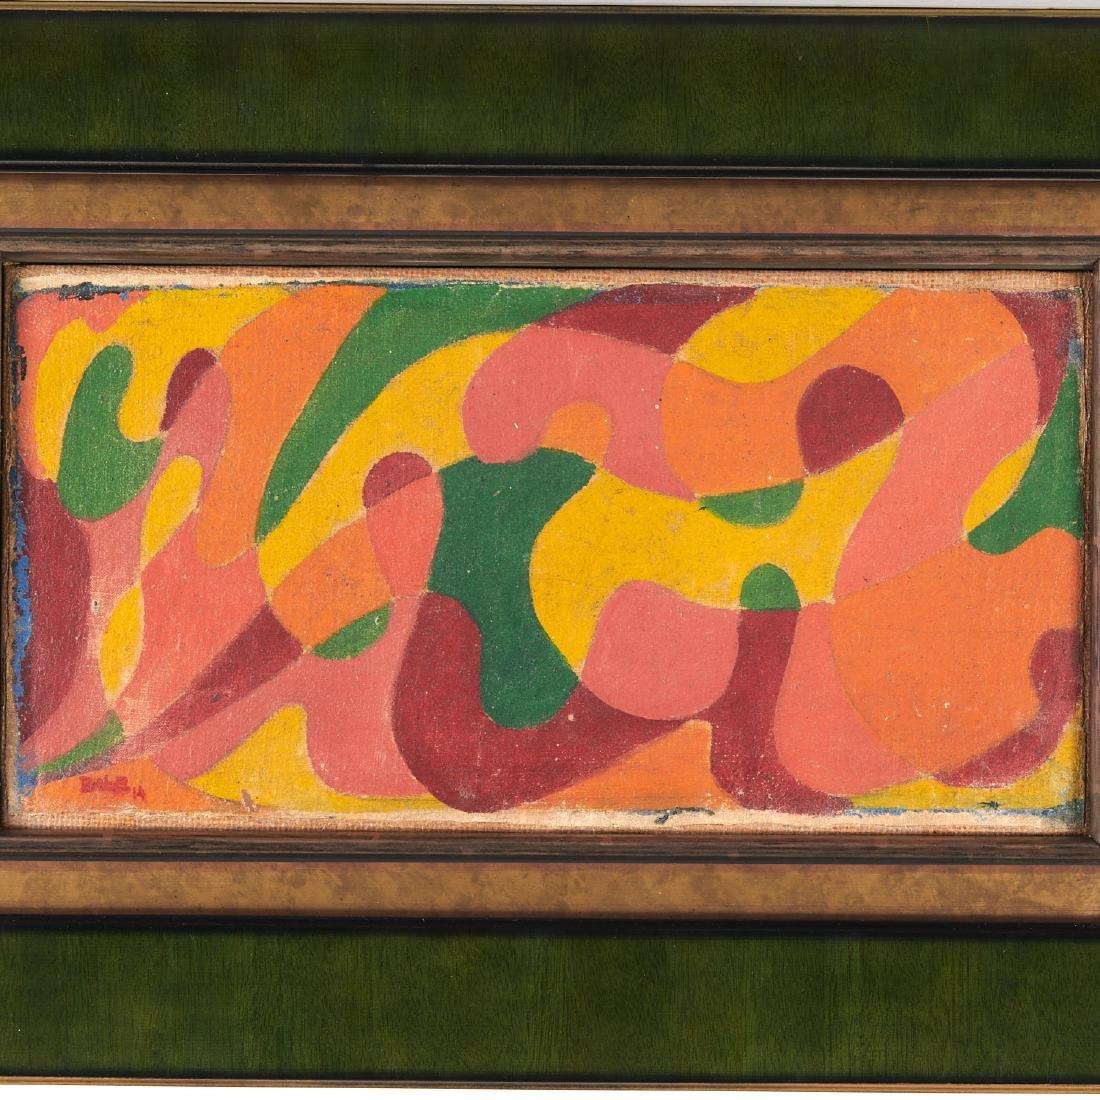 Giacomo Balla, painting, dated 1914 - 2